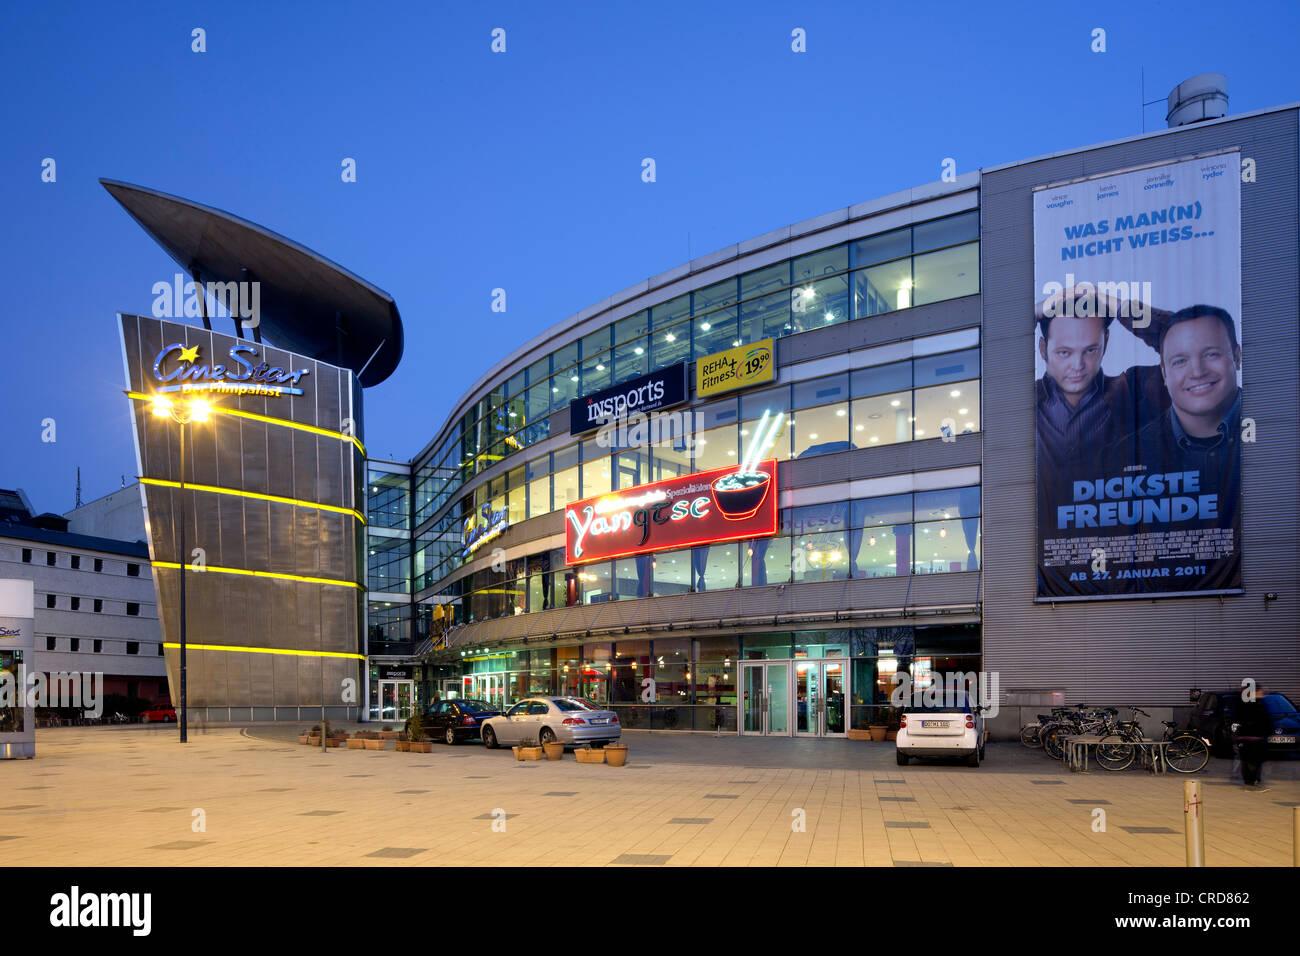 Cinema Dortmund